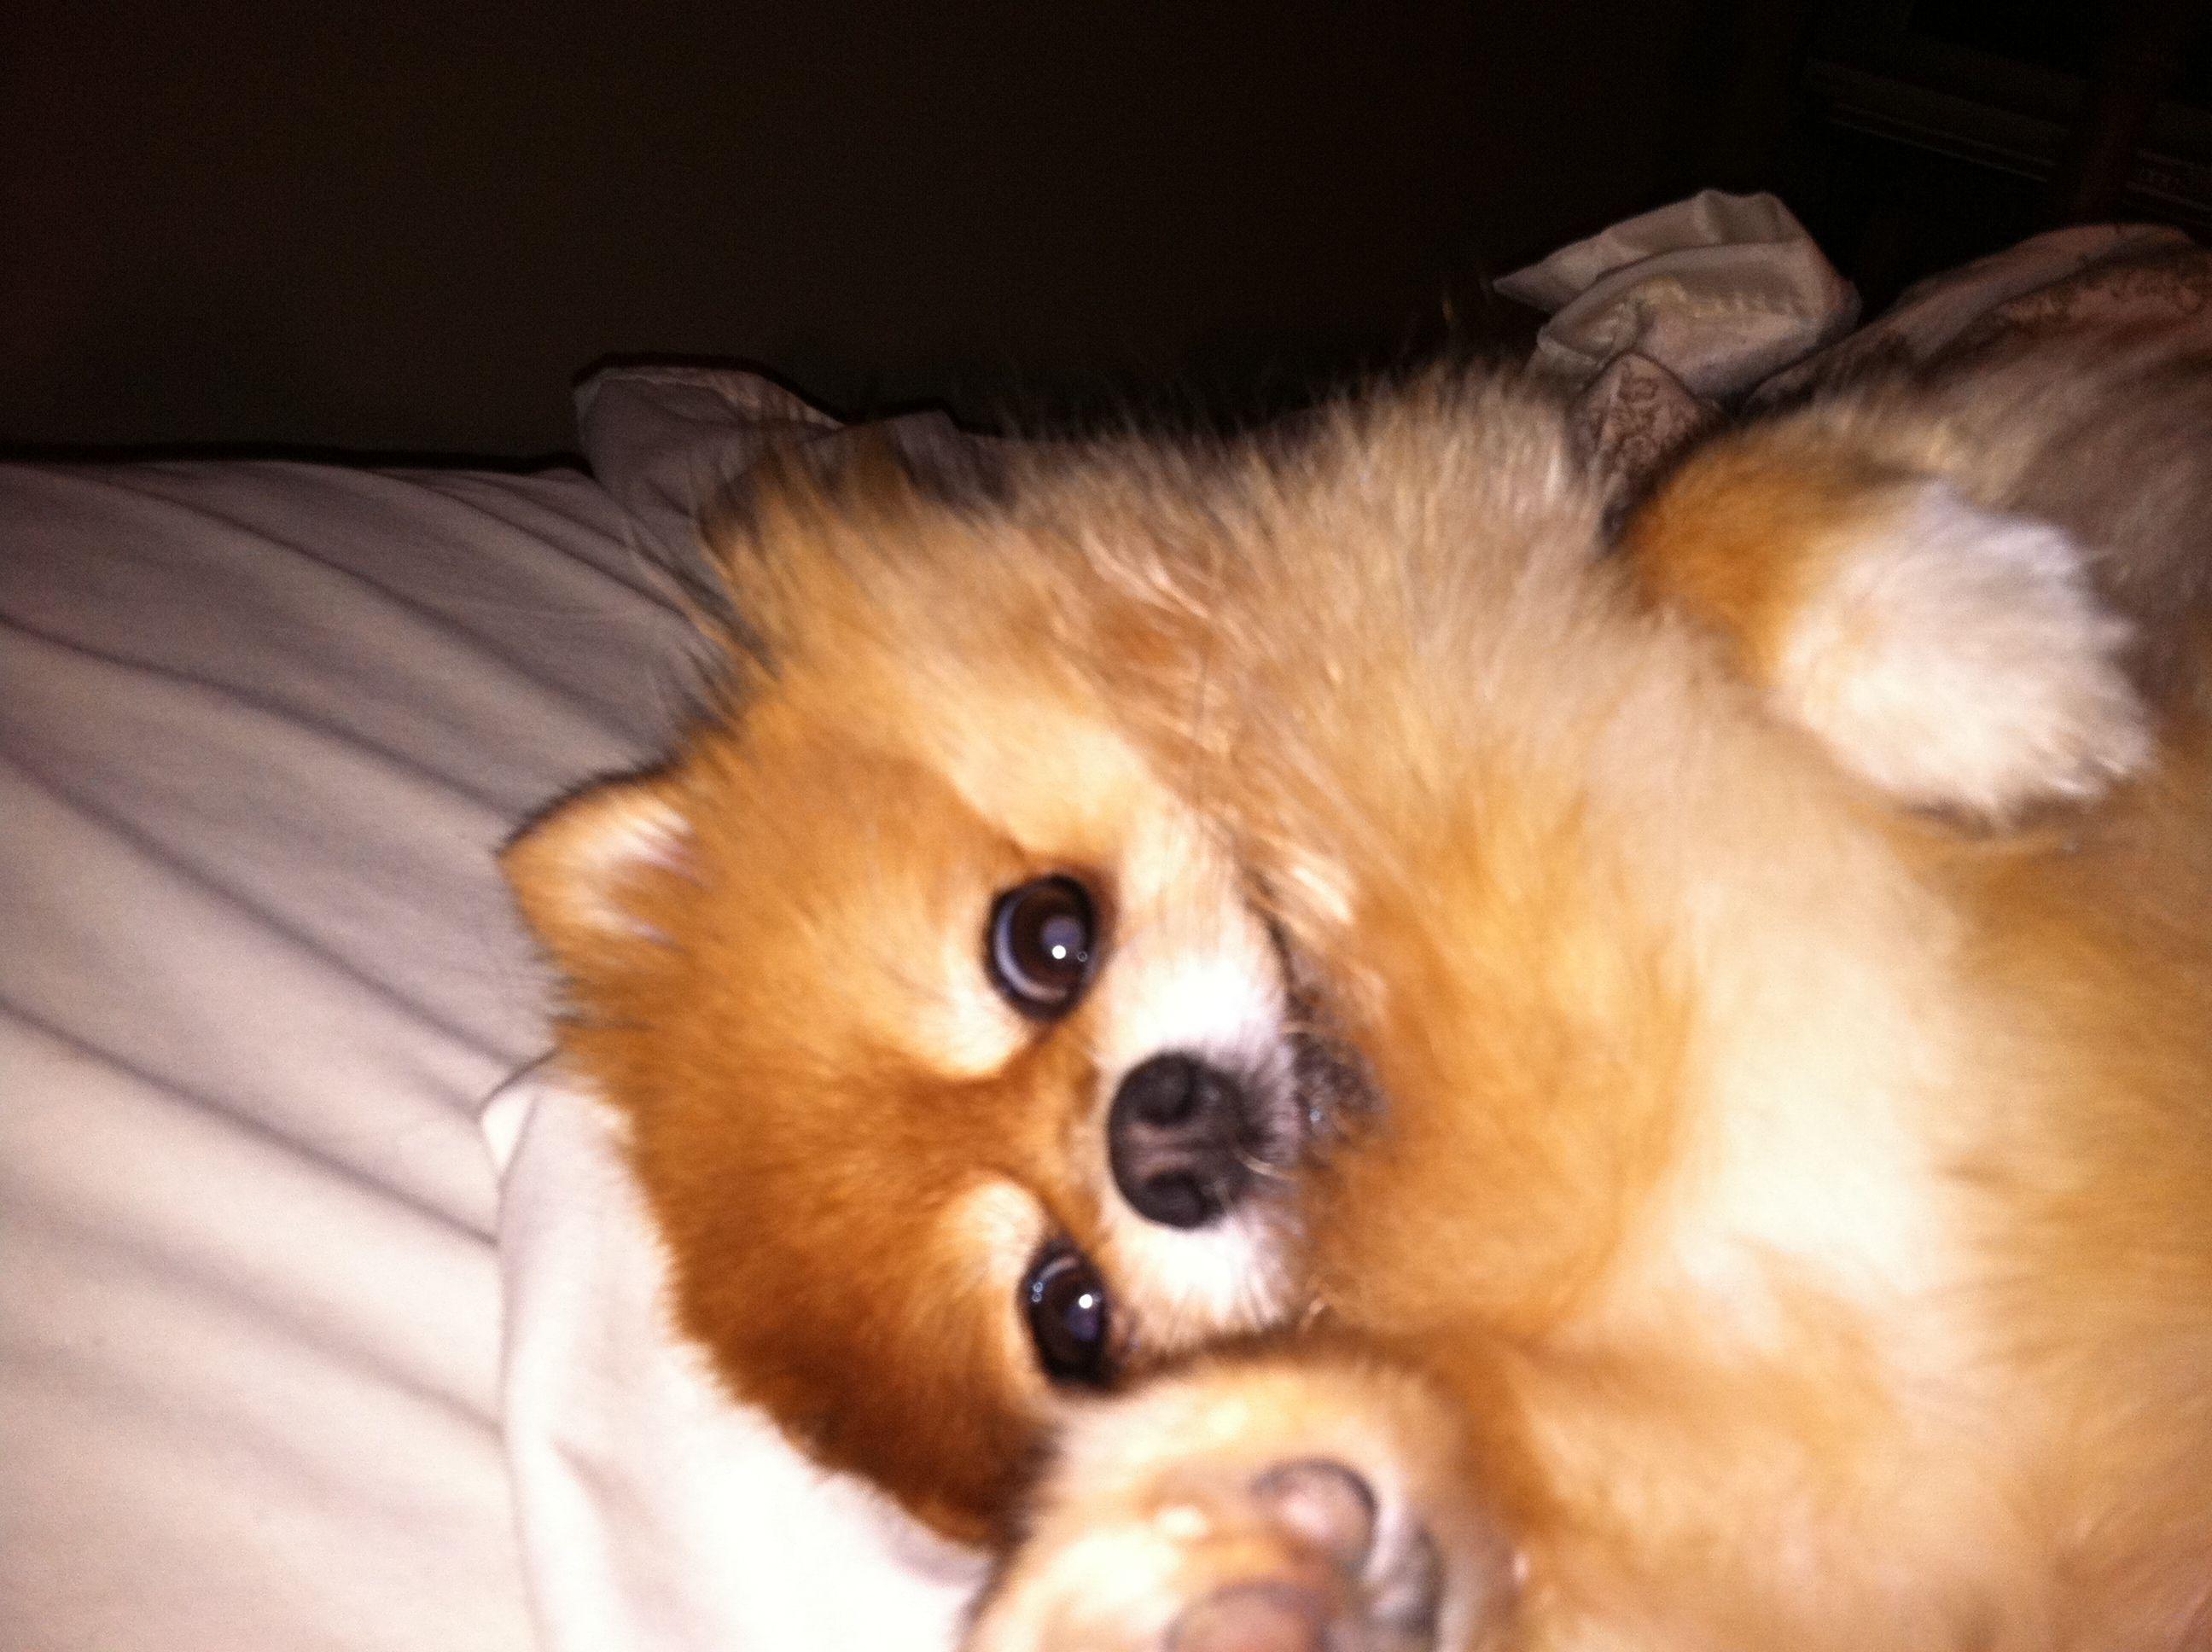 Pomeranian says hi (With images) Pets, Pomeranian, Animals